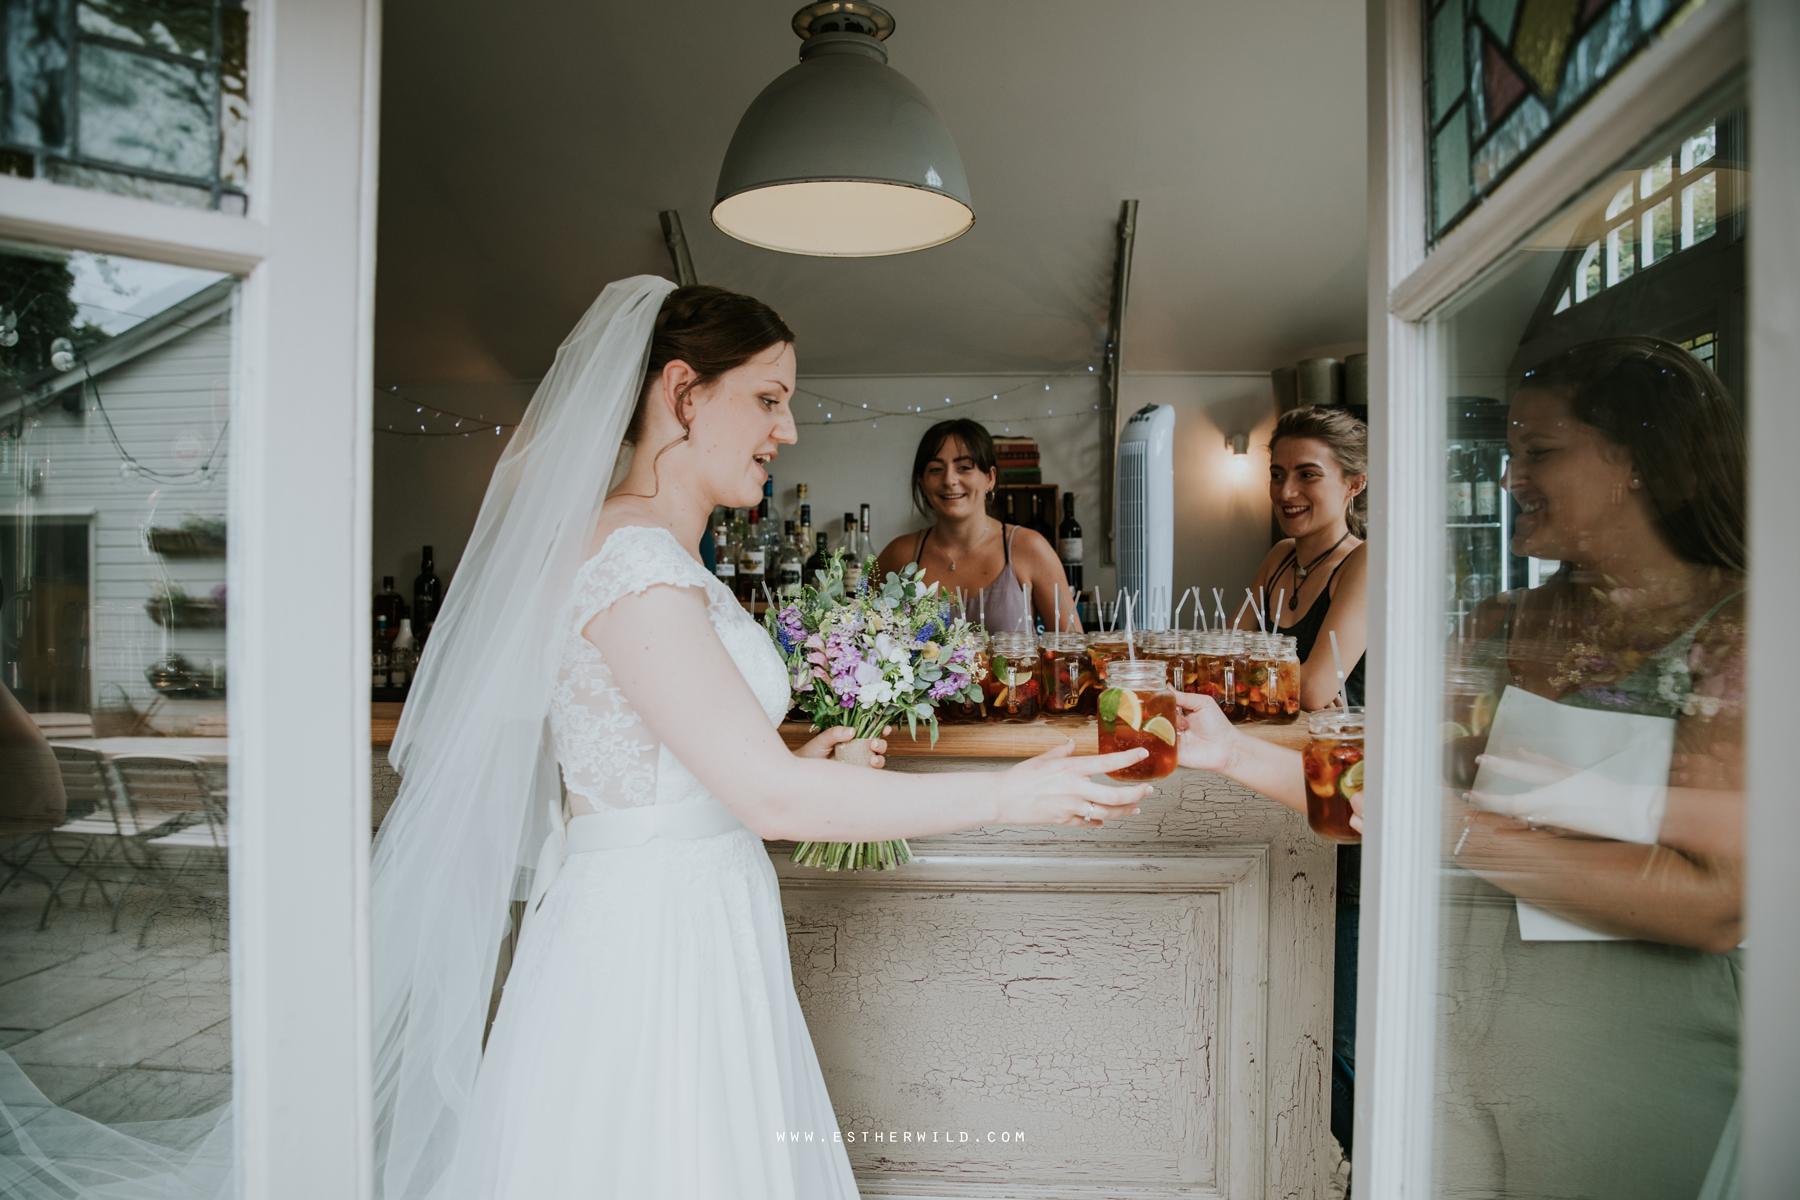 The_Georgian_Townhouse_Wedding_Norwich_Esther_Wild_Photographer_3R8A1290.jpg